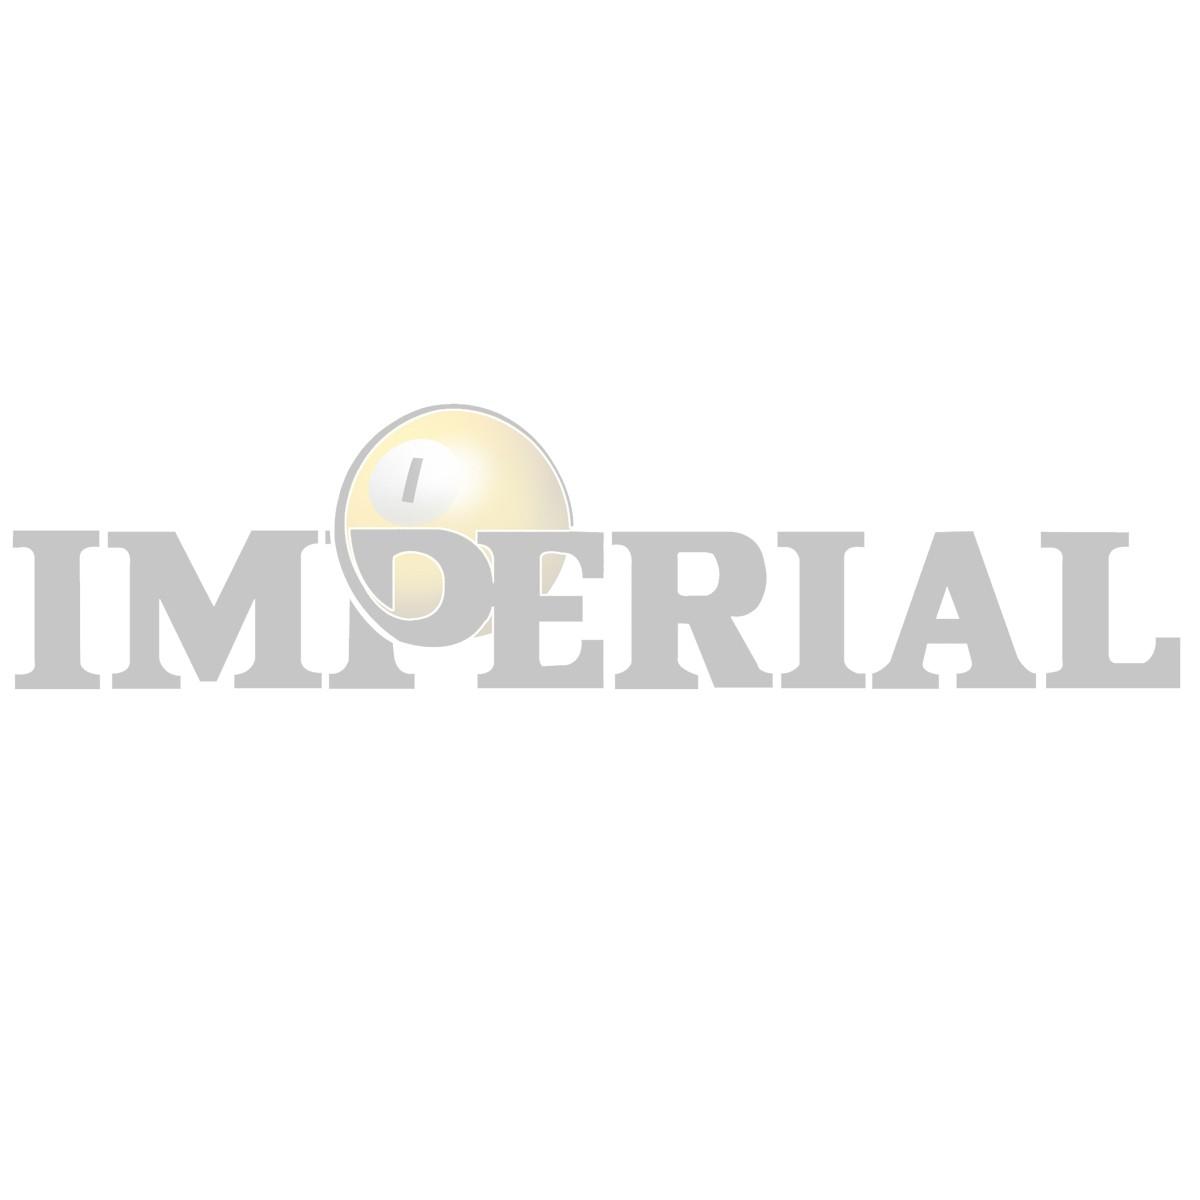 OHIO STATE PUB CAPTAINS CHAIR, WHITE